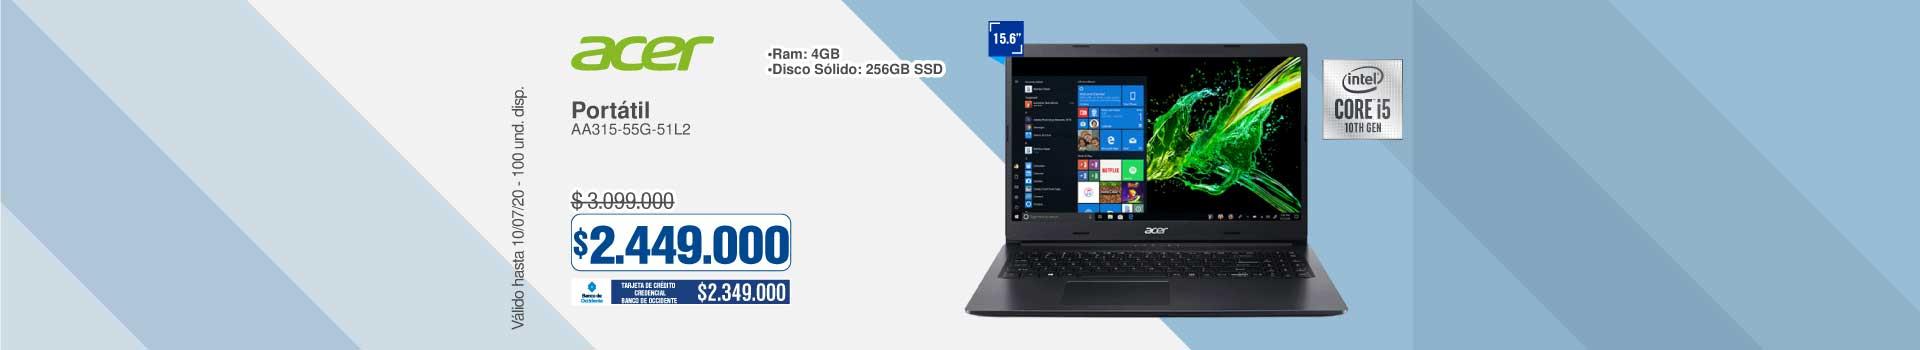 ak-hiper-1-Port-15-Acer-51L2-Ci5-10ma-Ng03-julio-2020